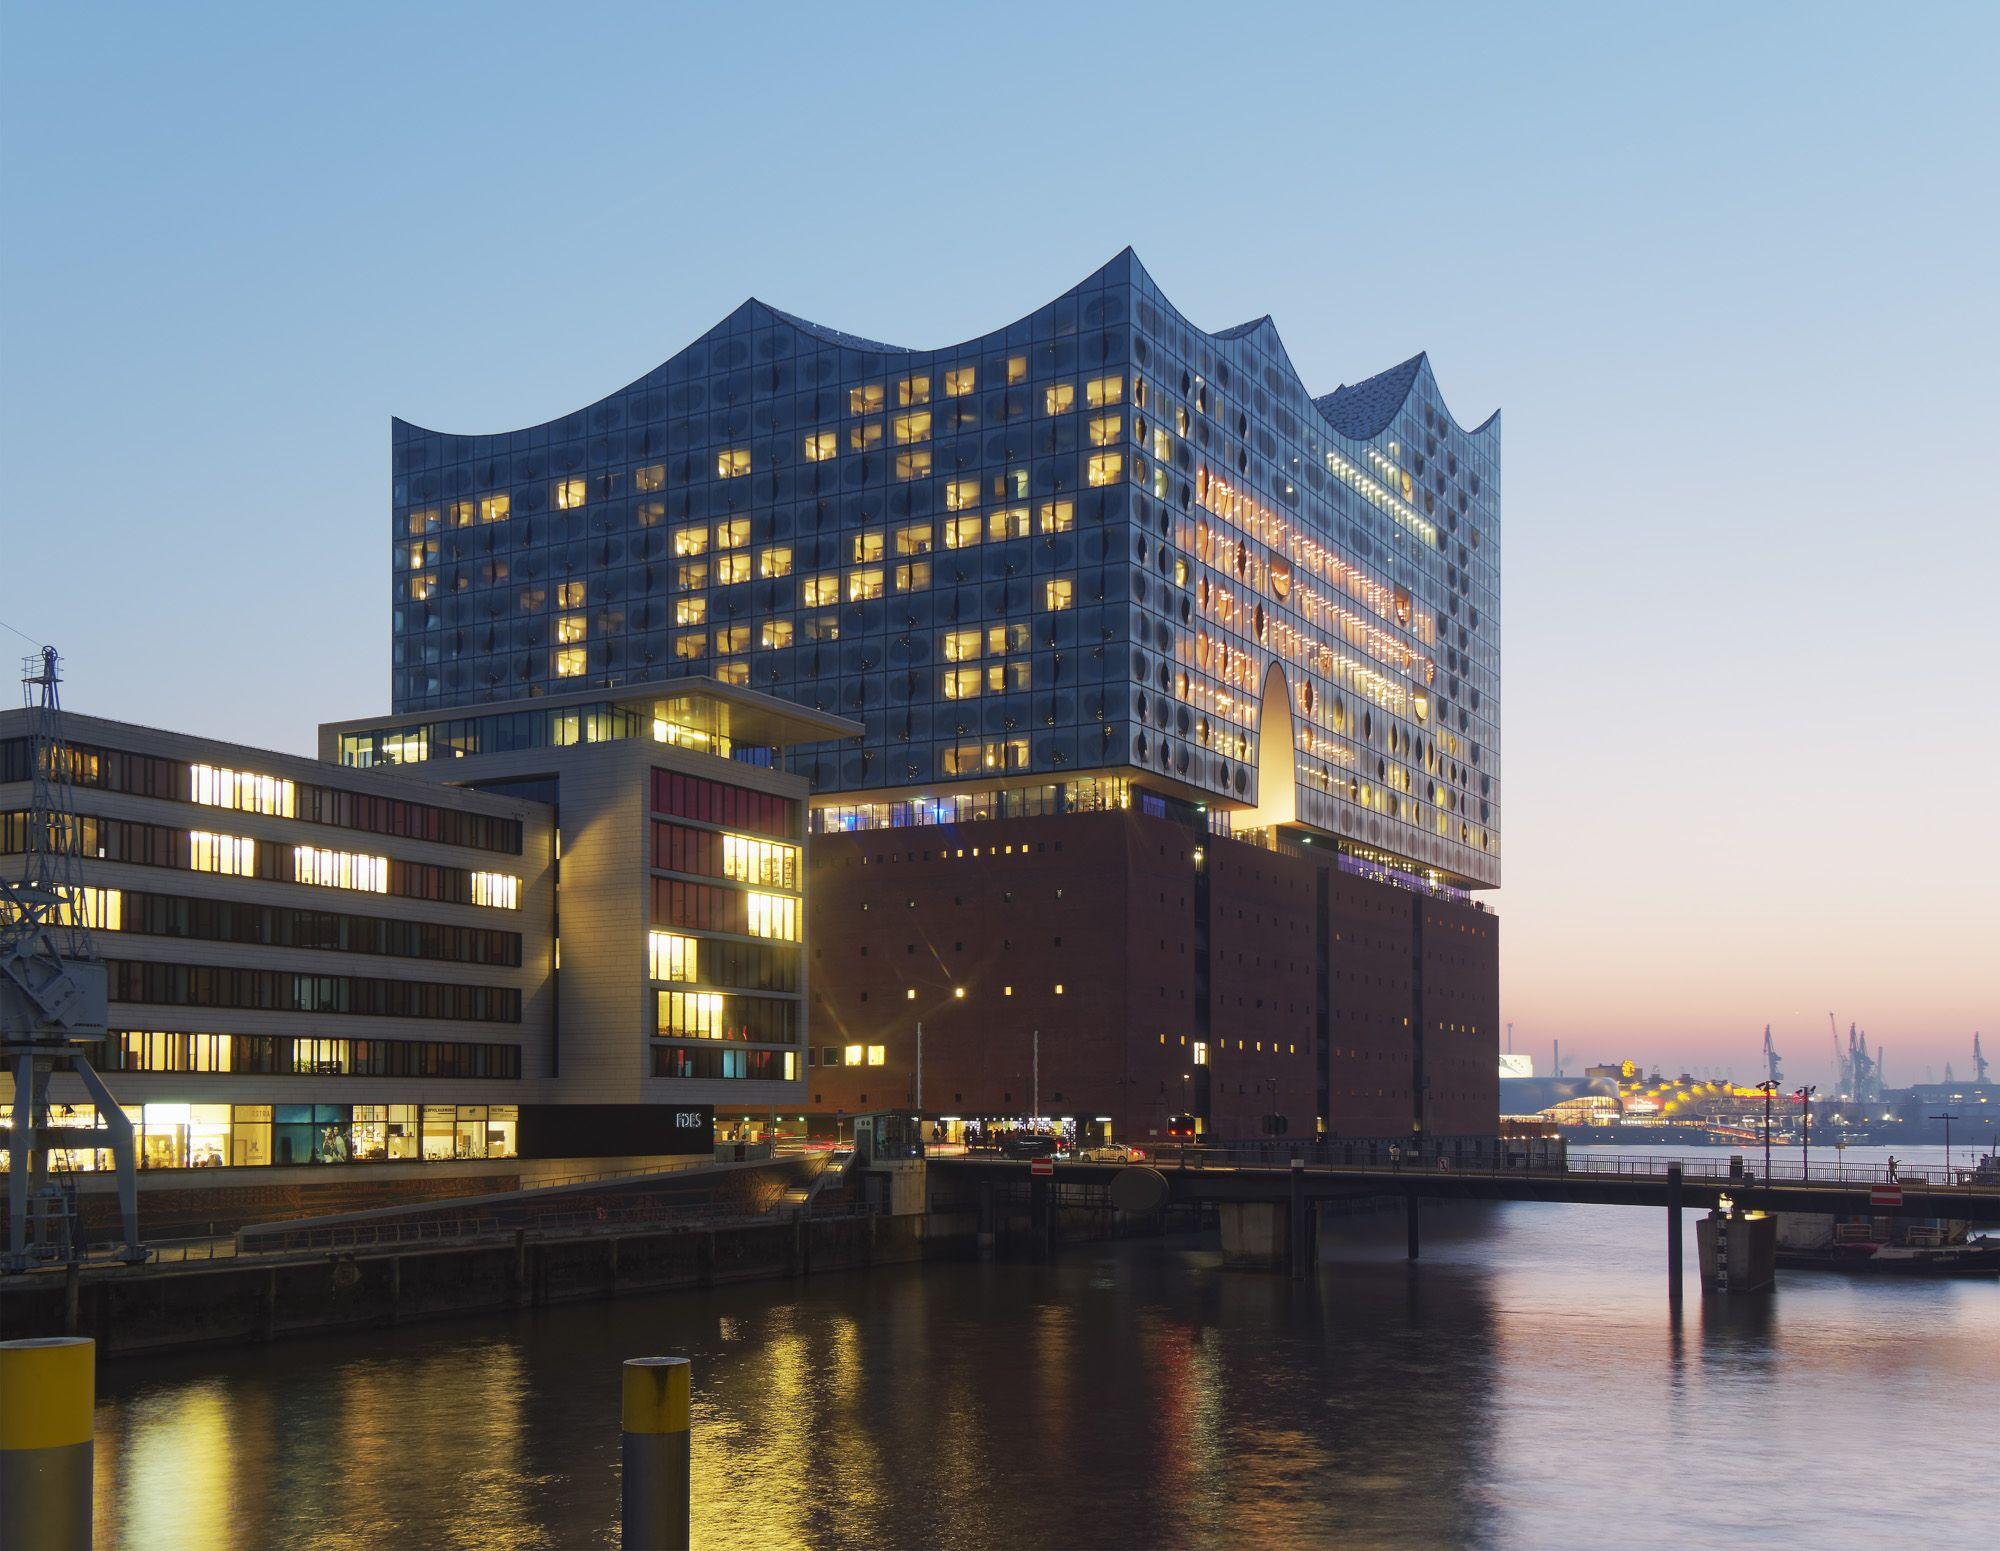 Elbphilharmonie Hamburg Fertiggestellt 2017 Foto Architektur Photos De Mark Wohlrab Elbphilharmonie Hamburg Hamburg